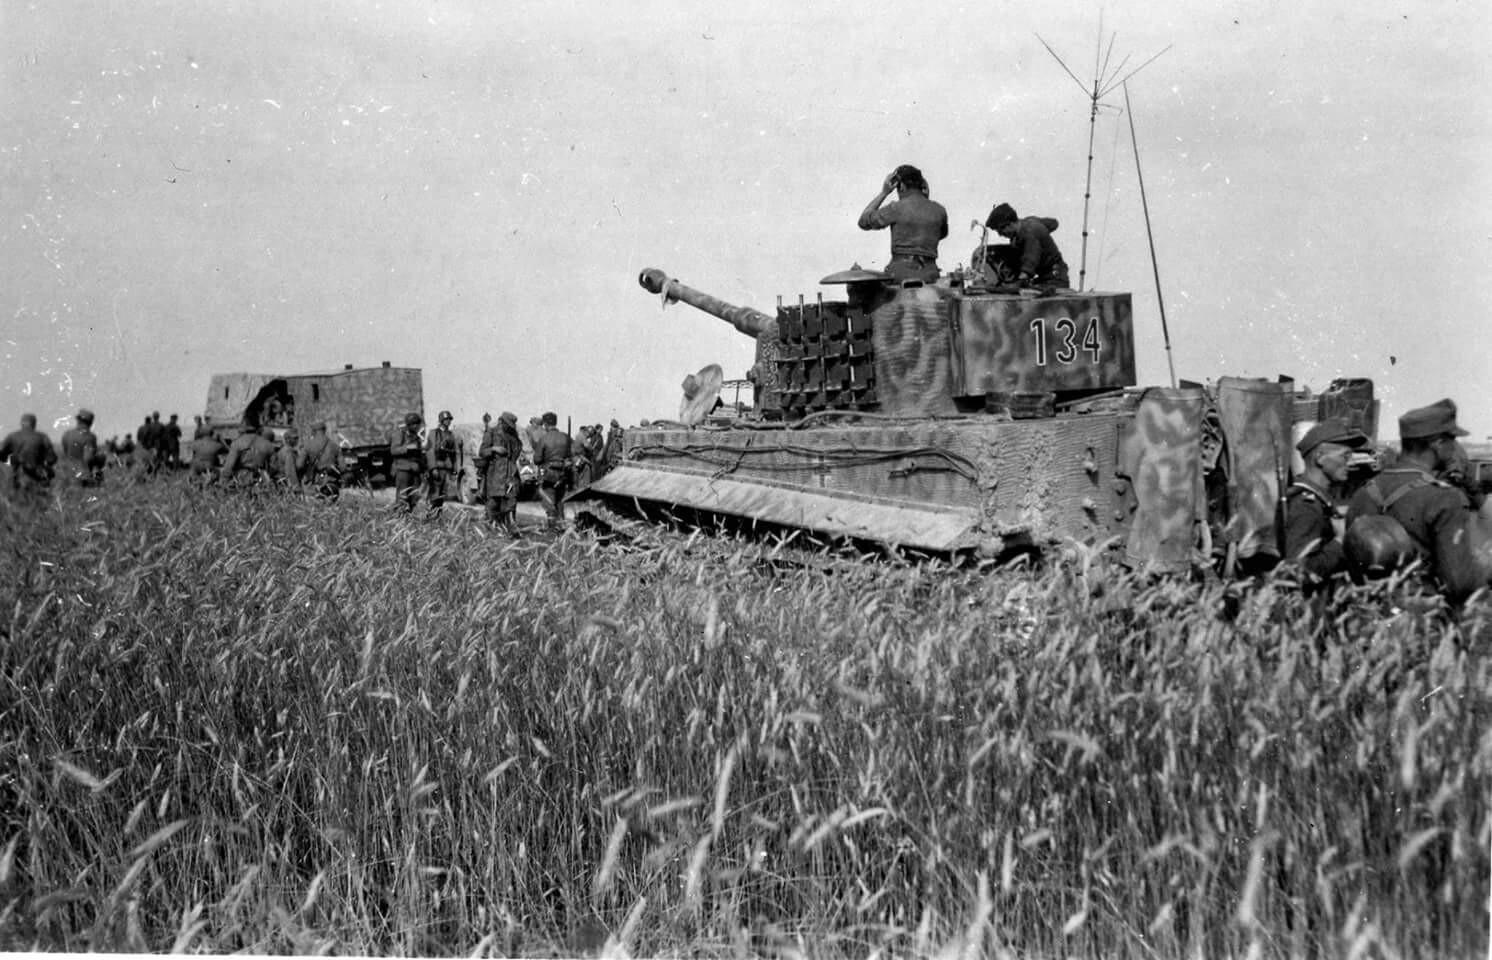 tiger tank images에 대한 이미지 검색결과